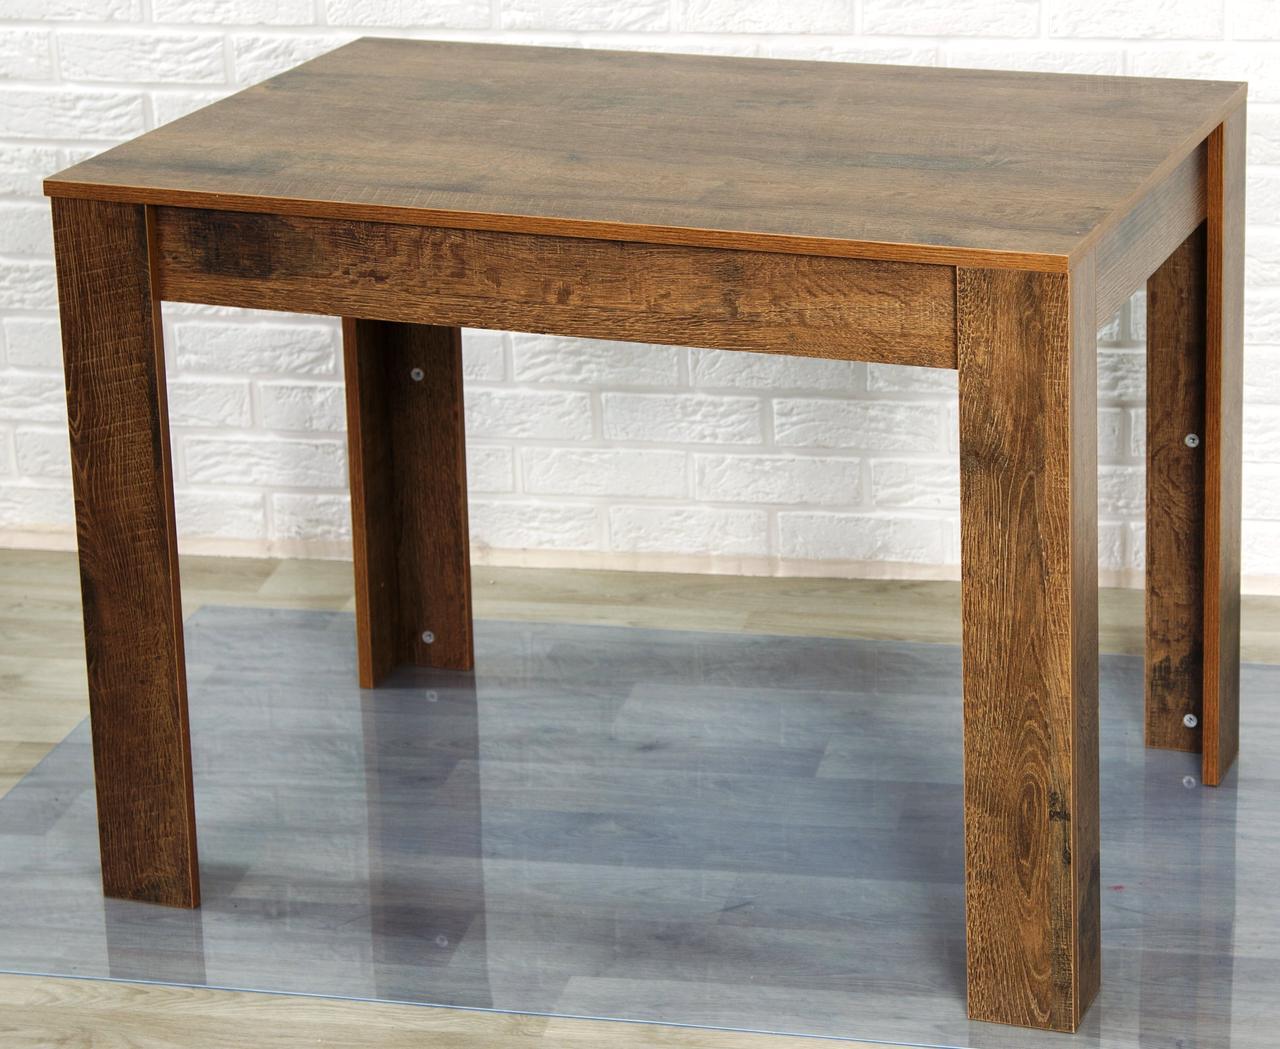 Стол обеденный кухонный Андервуд 100х70 см (фрегат)